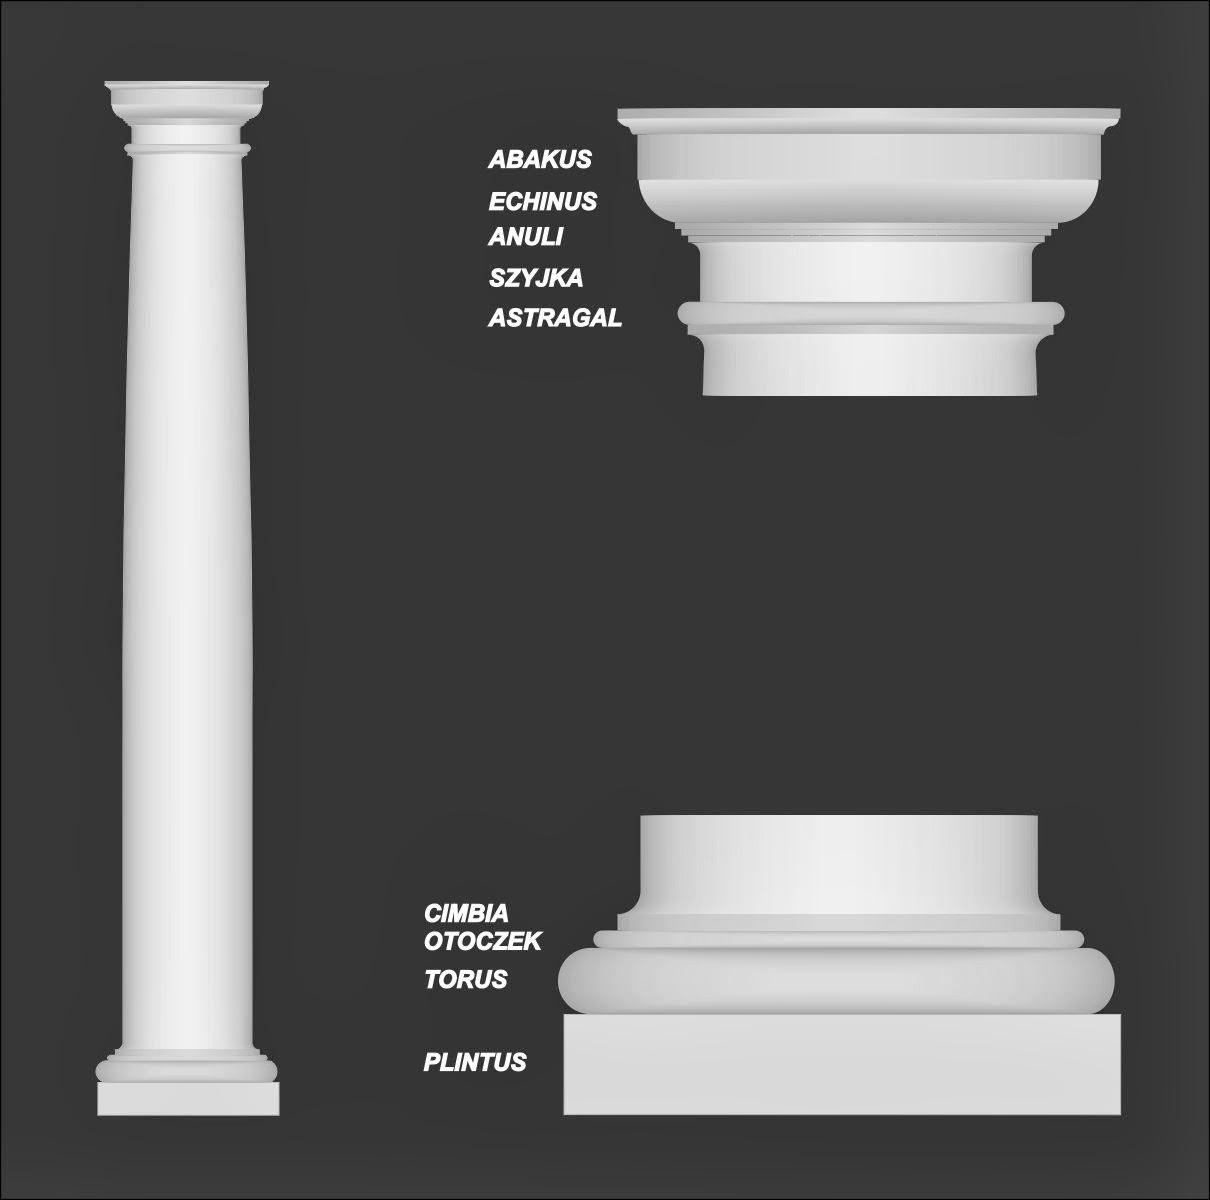 kolumny betonowe, kolumny doryckie dorische saule